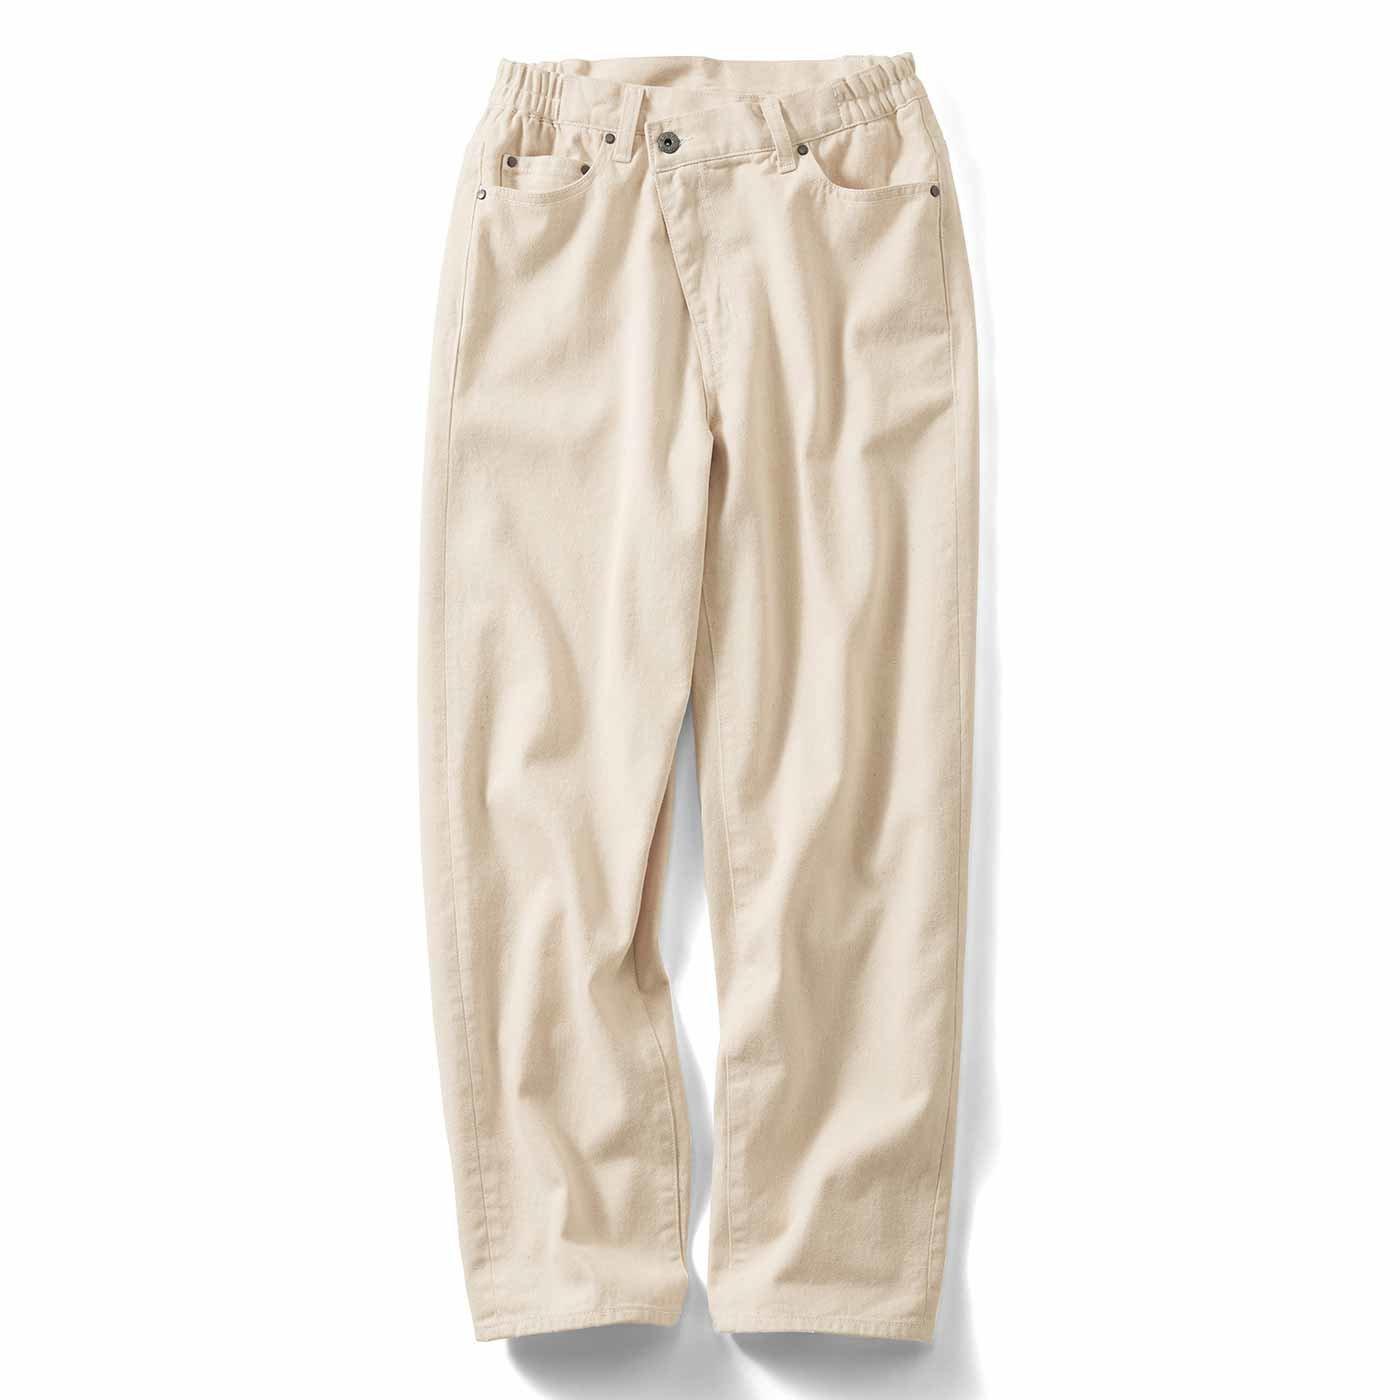 IEDIT[イディット] 大人にちょうどいい斜めファスナーのゆるストレートジーンズ〈生成りホワイト〉